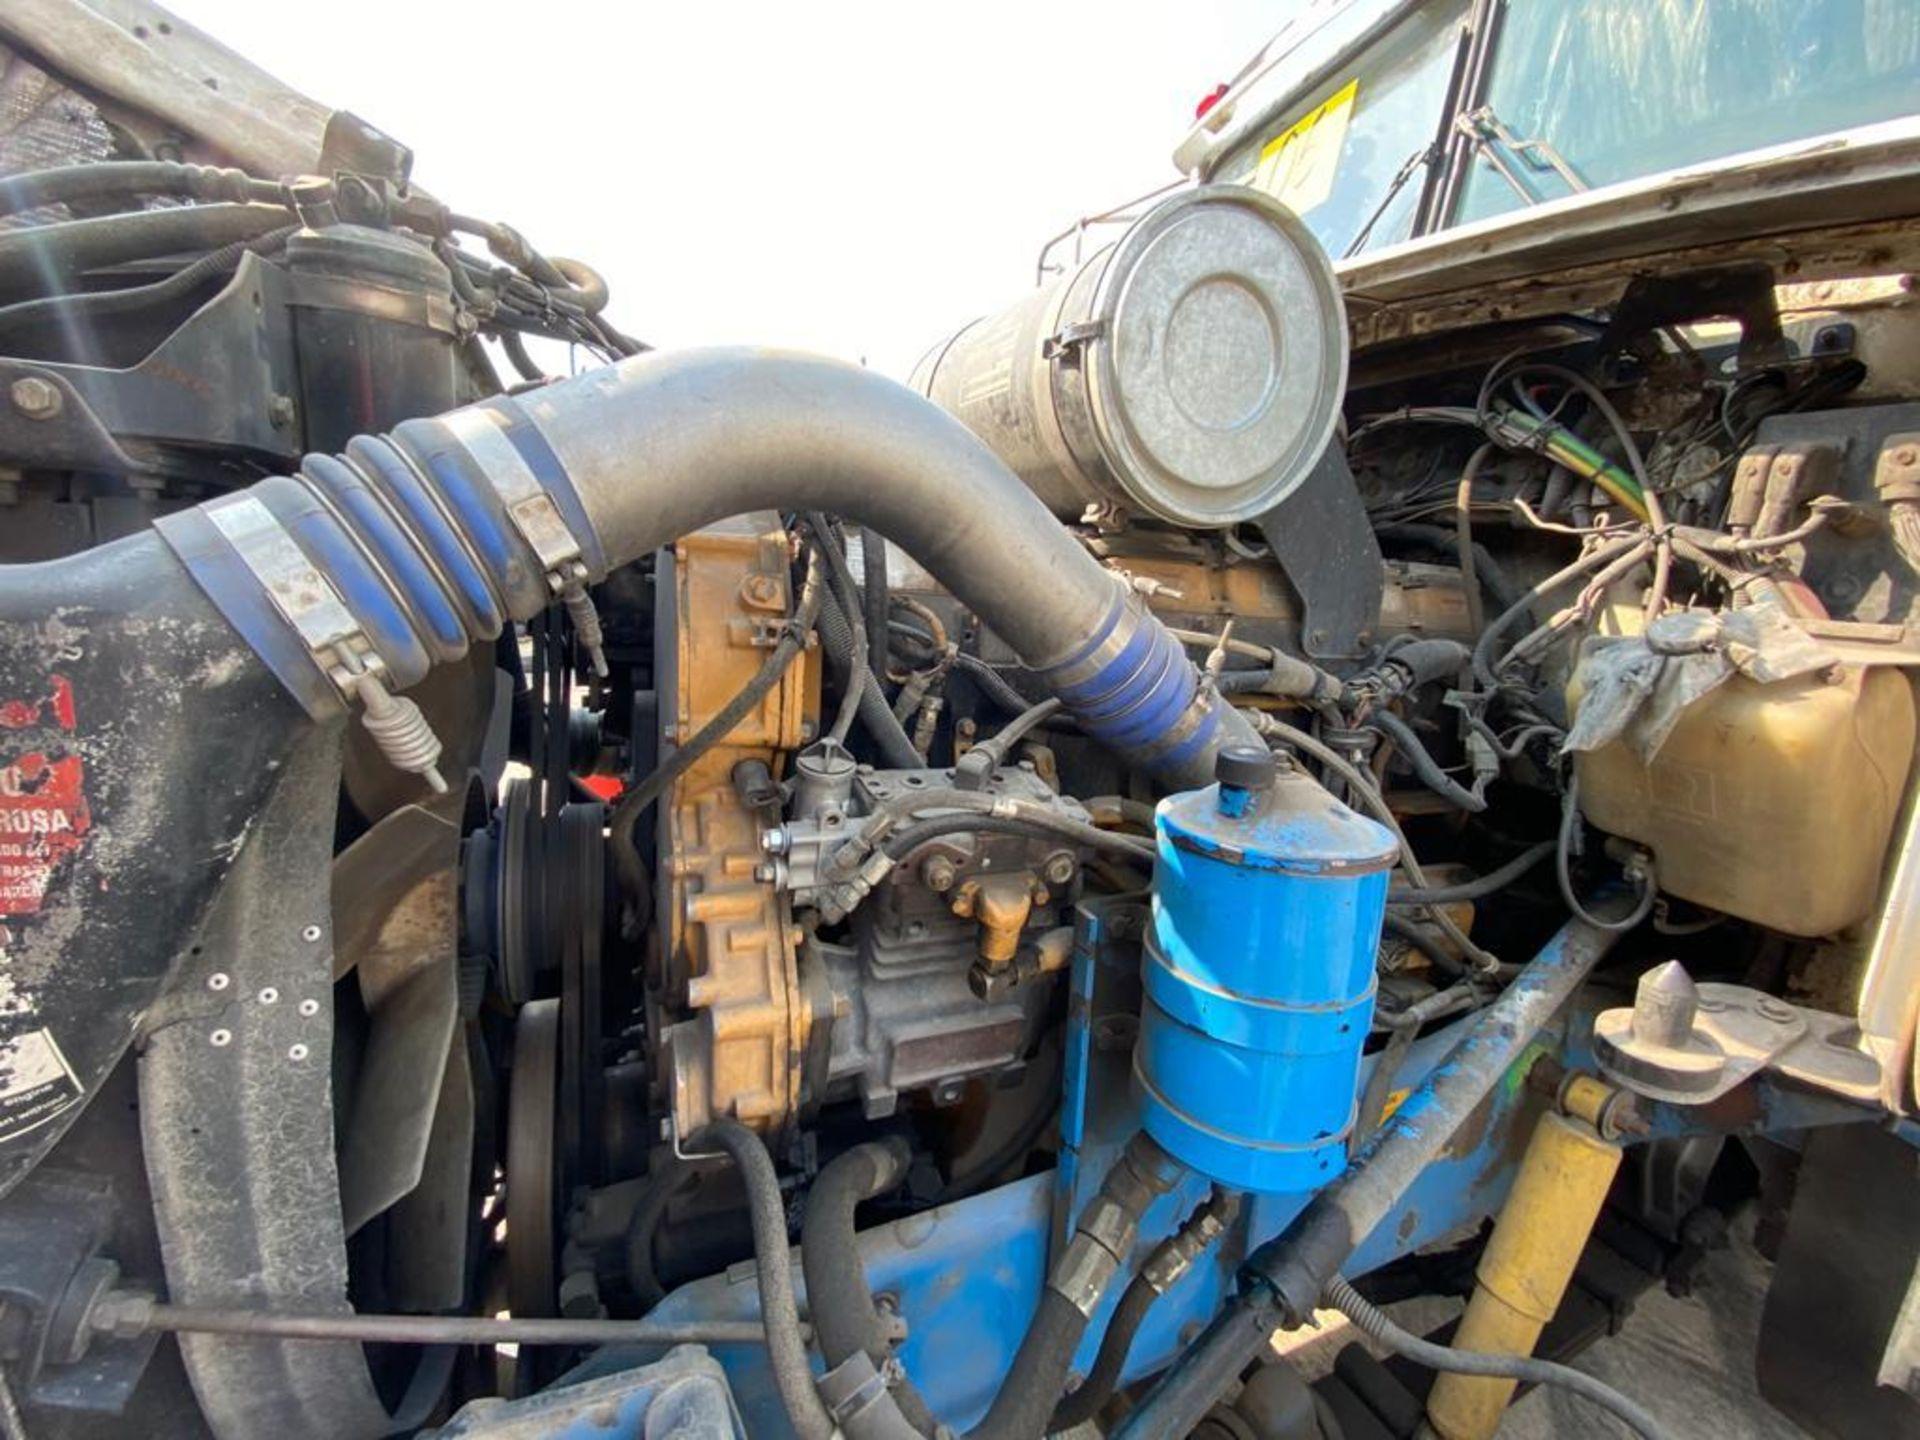 1998 Kenworth Sleeper truck tractor, standard transmission of 18 speeds - Image 58 of 75